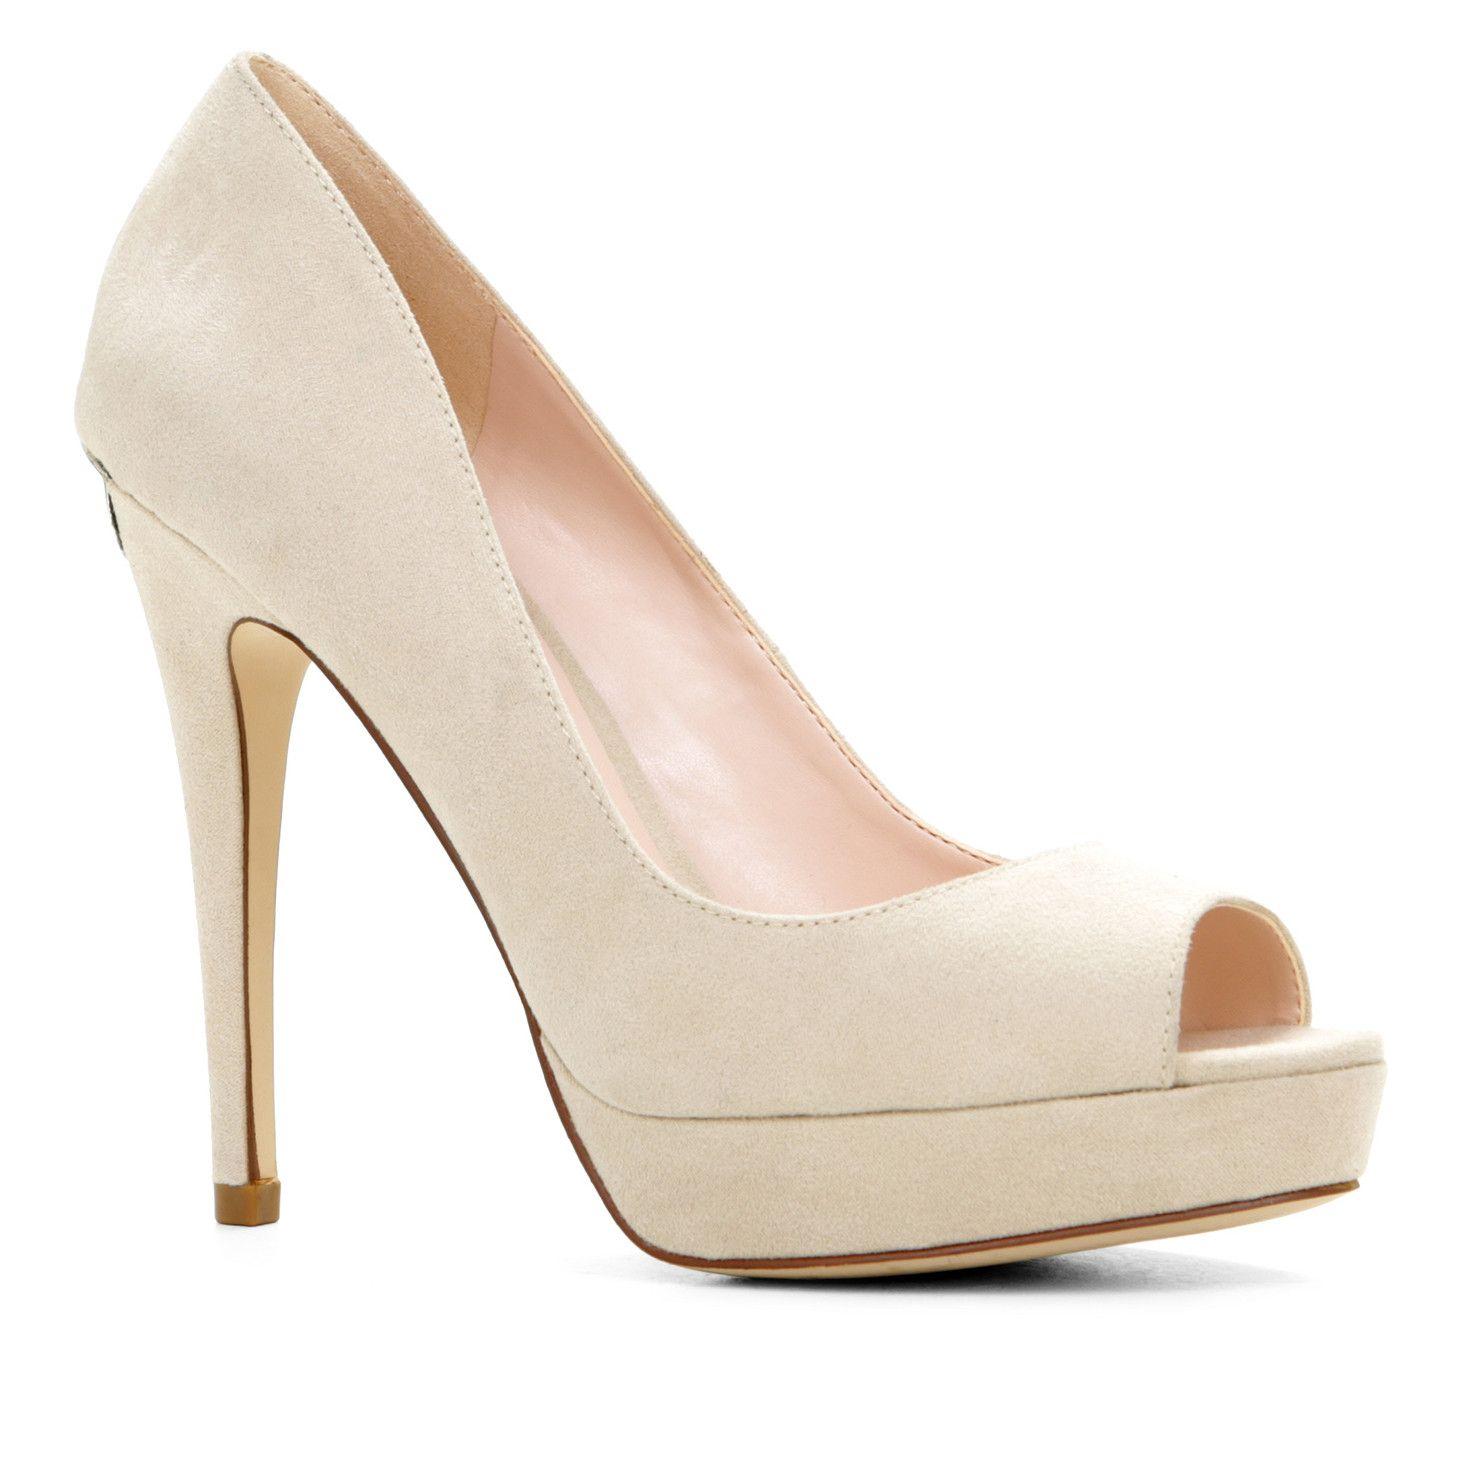 Aldo AOISA pumps, bone suede, 2015 - 01 · Bridesmaid ShoesShoes High Heels Women's ...